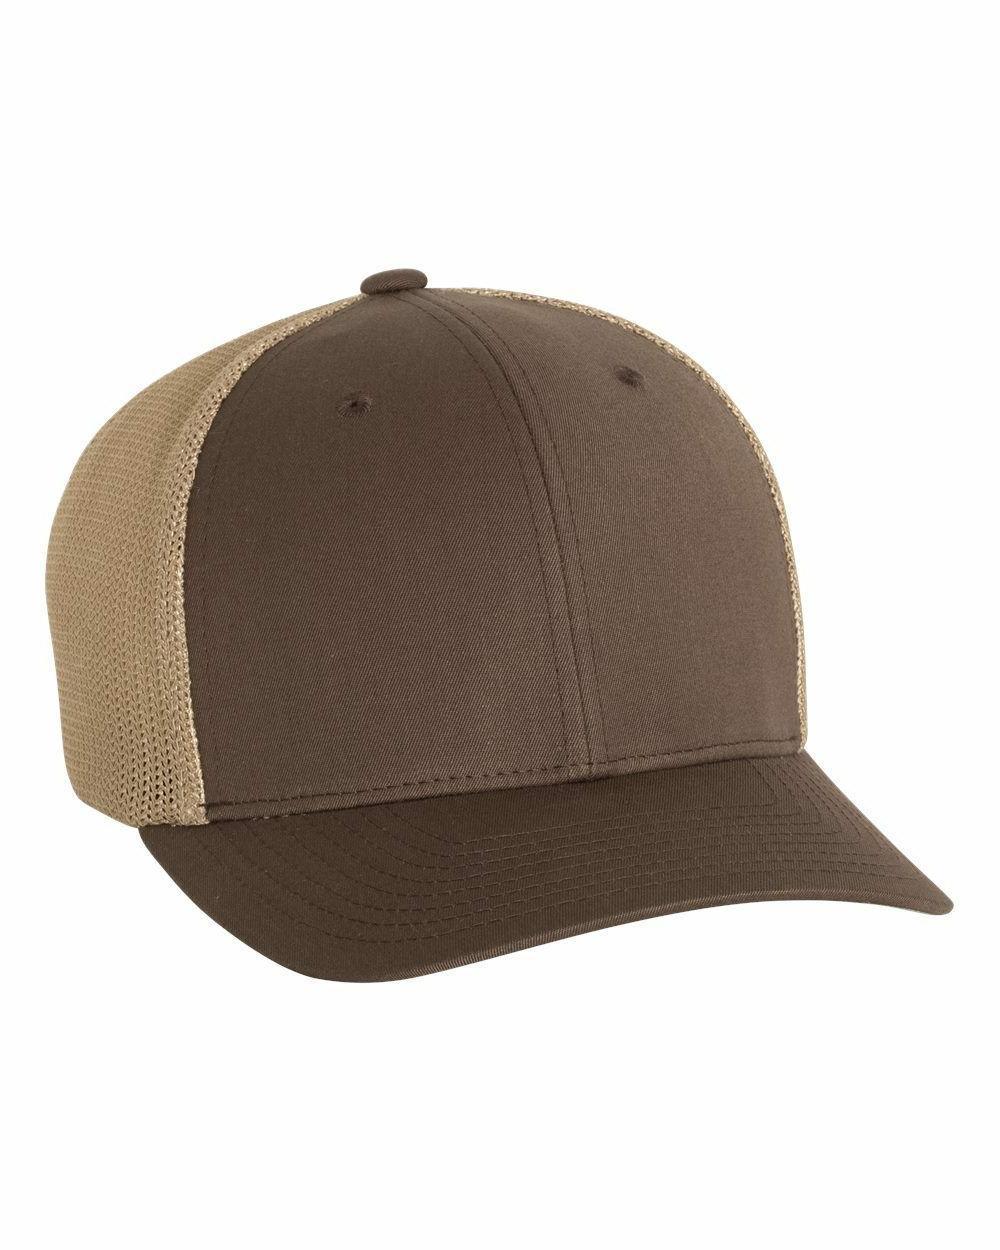 Flexfit - Trucker Cap - 6511 mesh back hat SHIPPING FLEX FIT